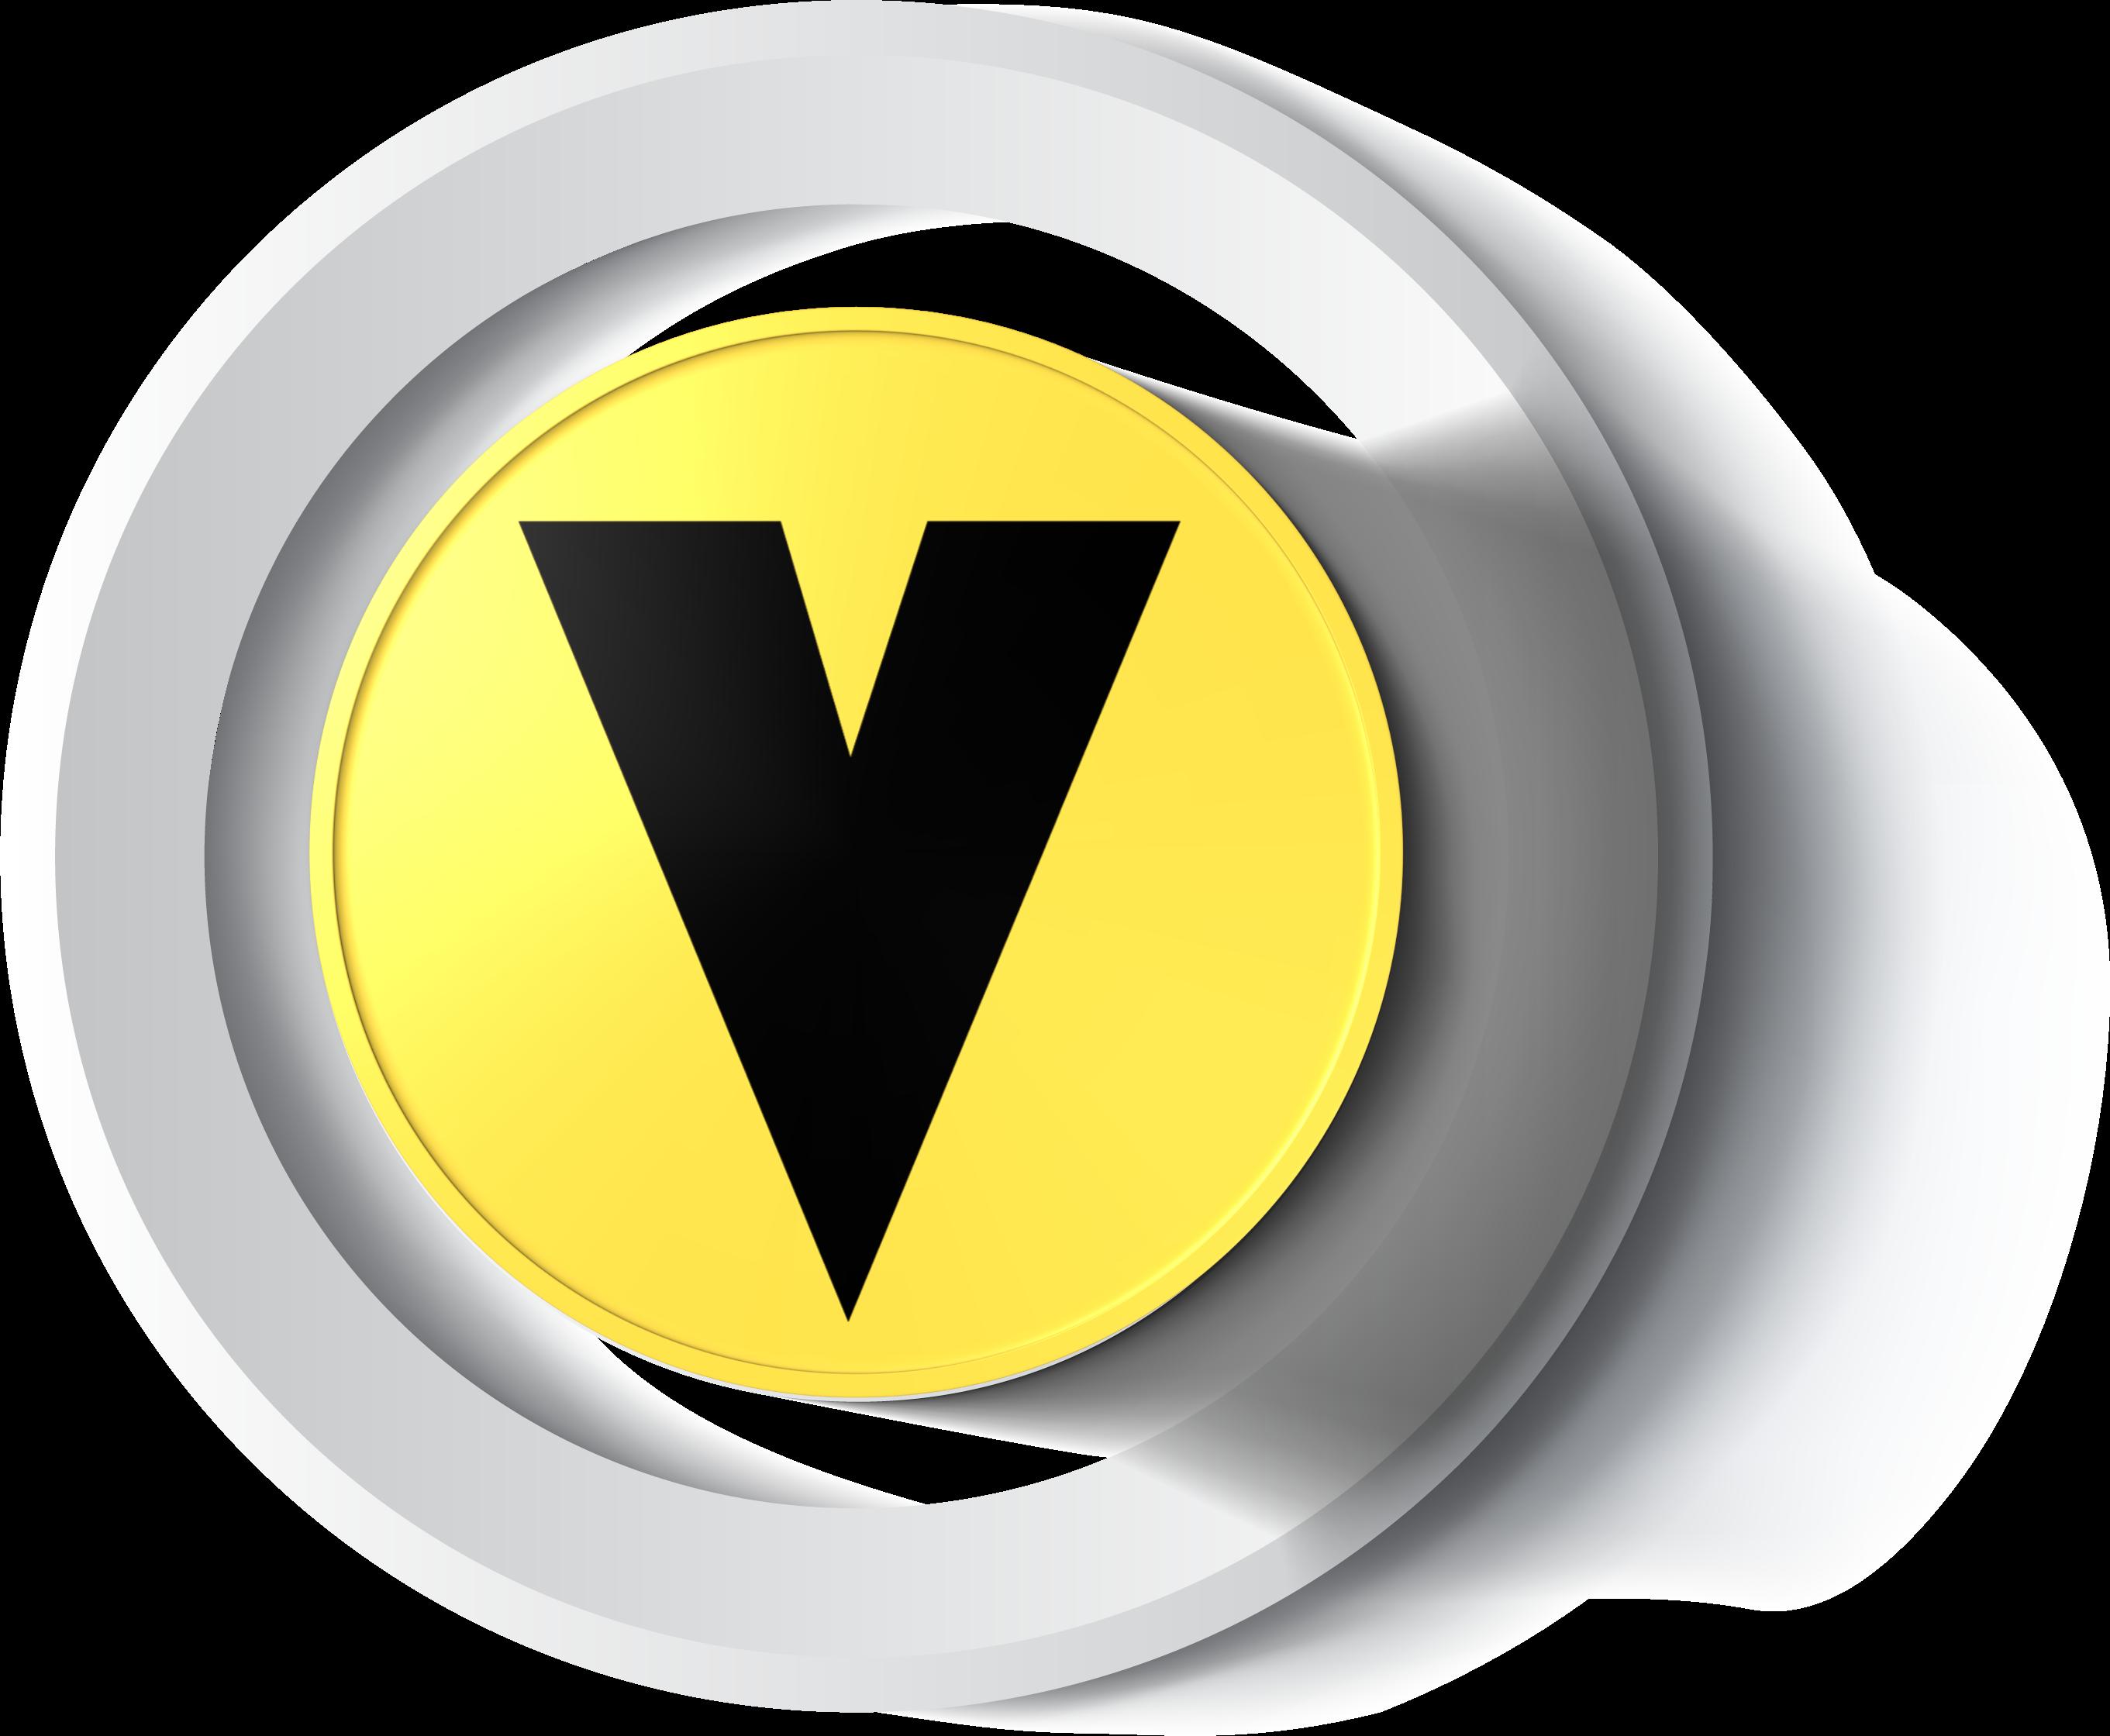 www.VisualBreakthroughs.com